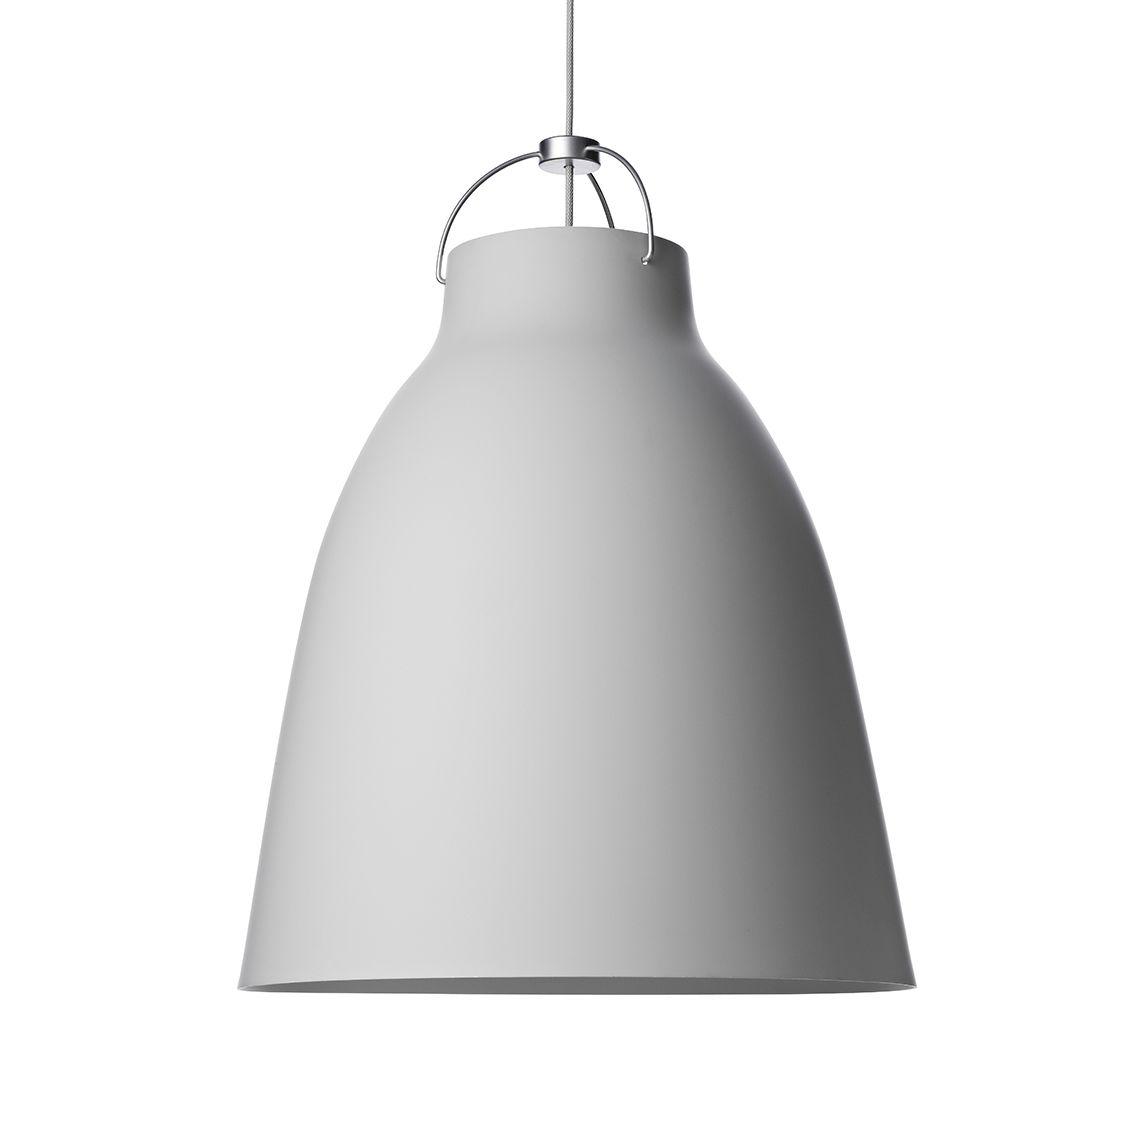 Caravaggio hanglamp Lightyears Ø40 mat grijs 25